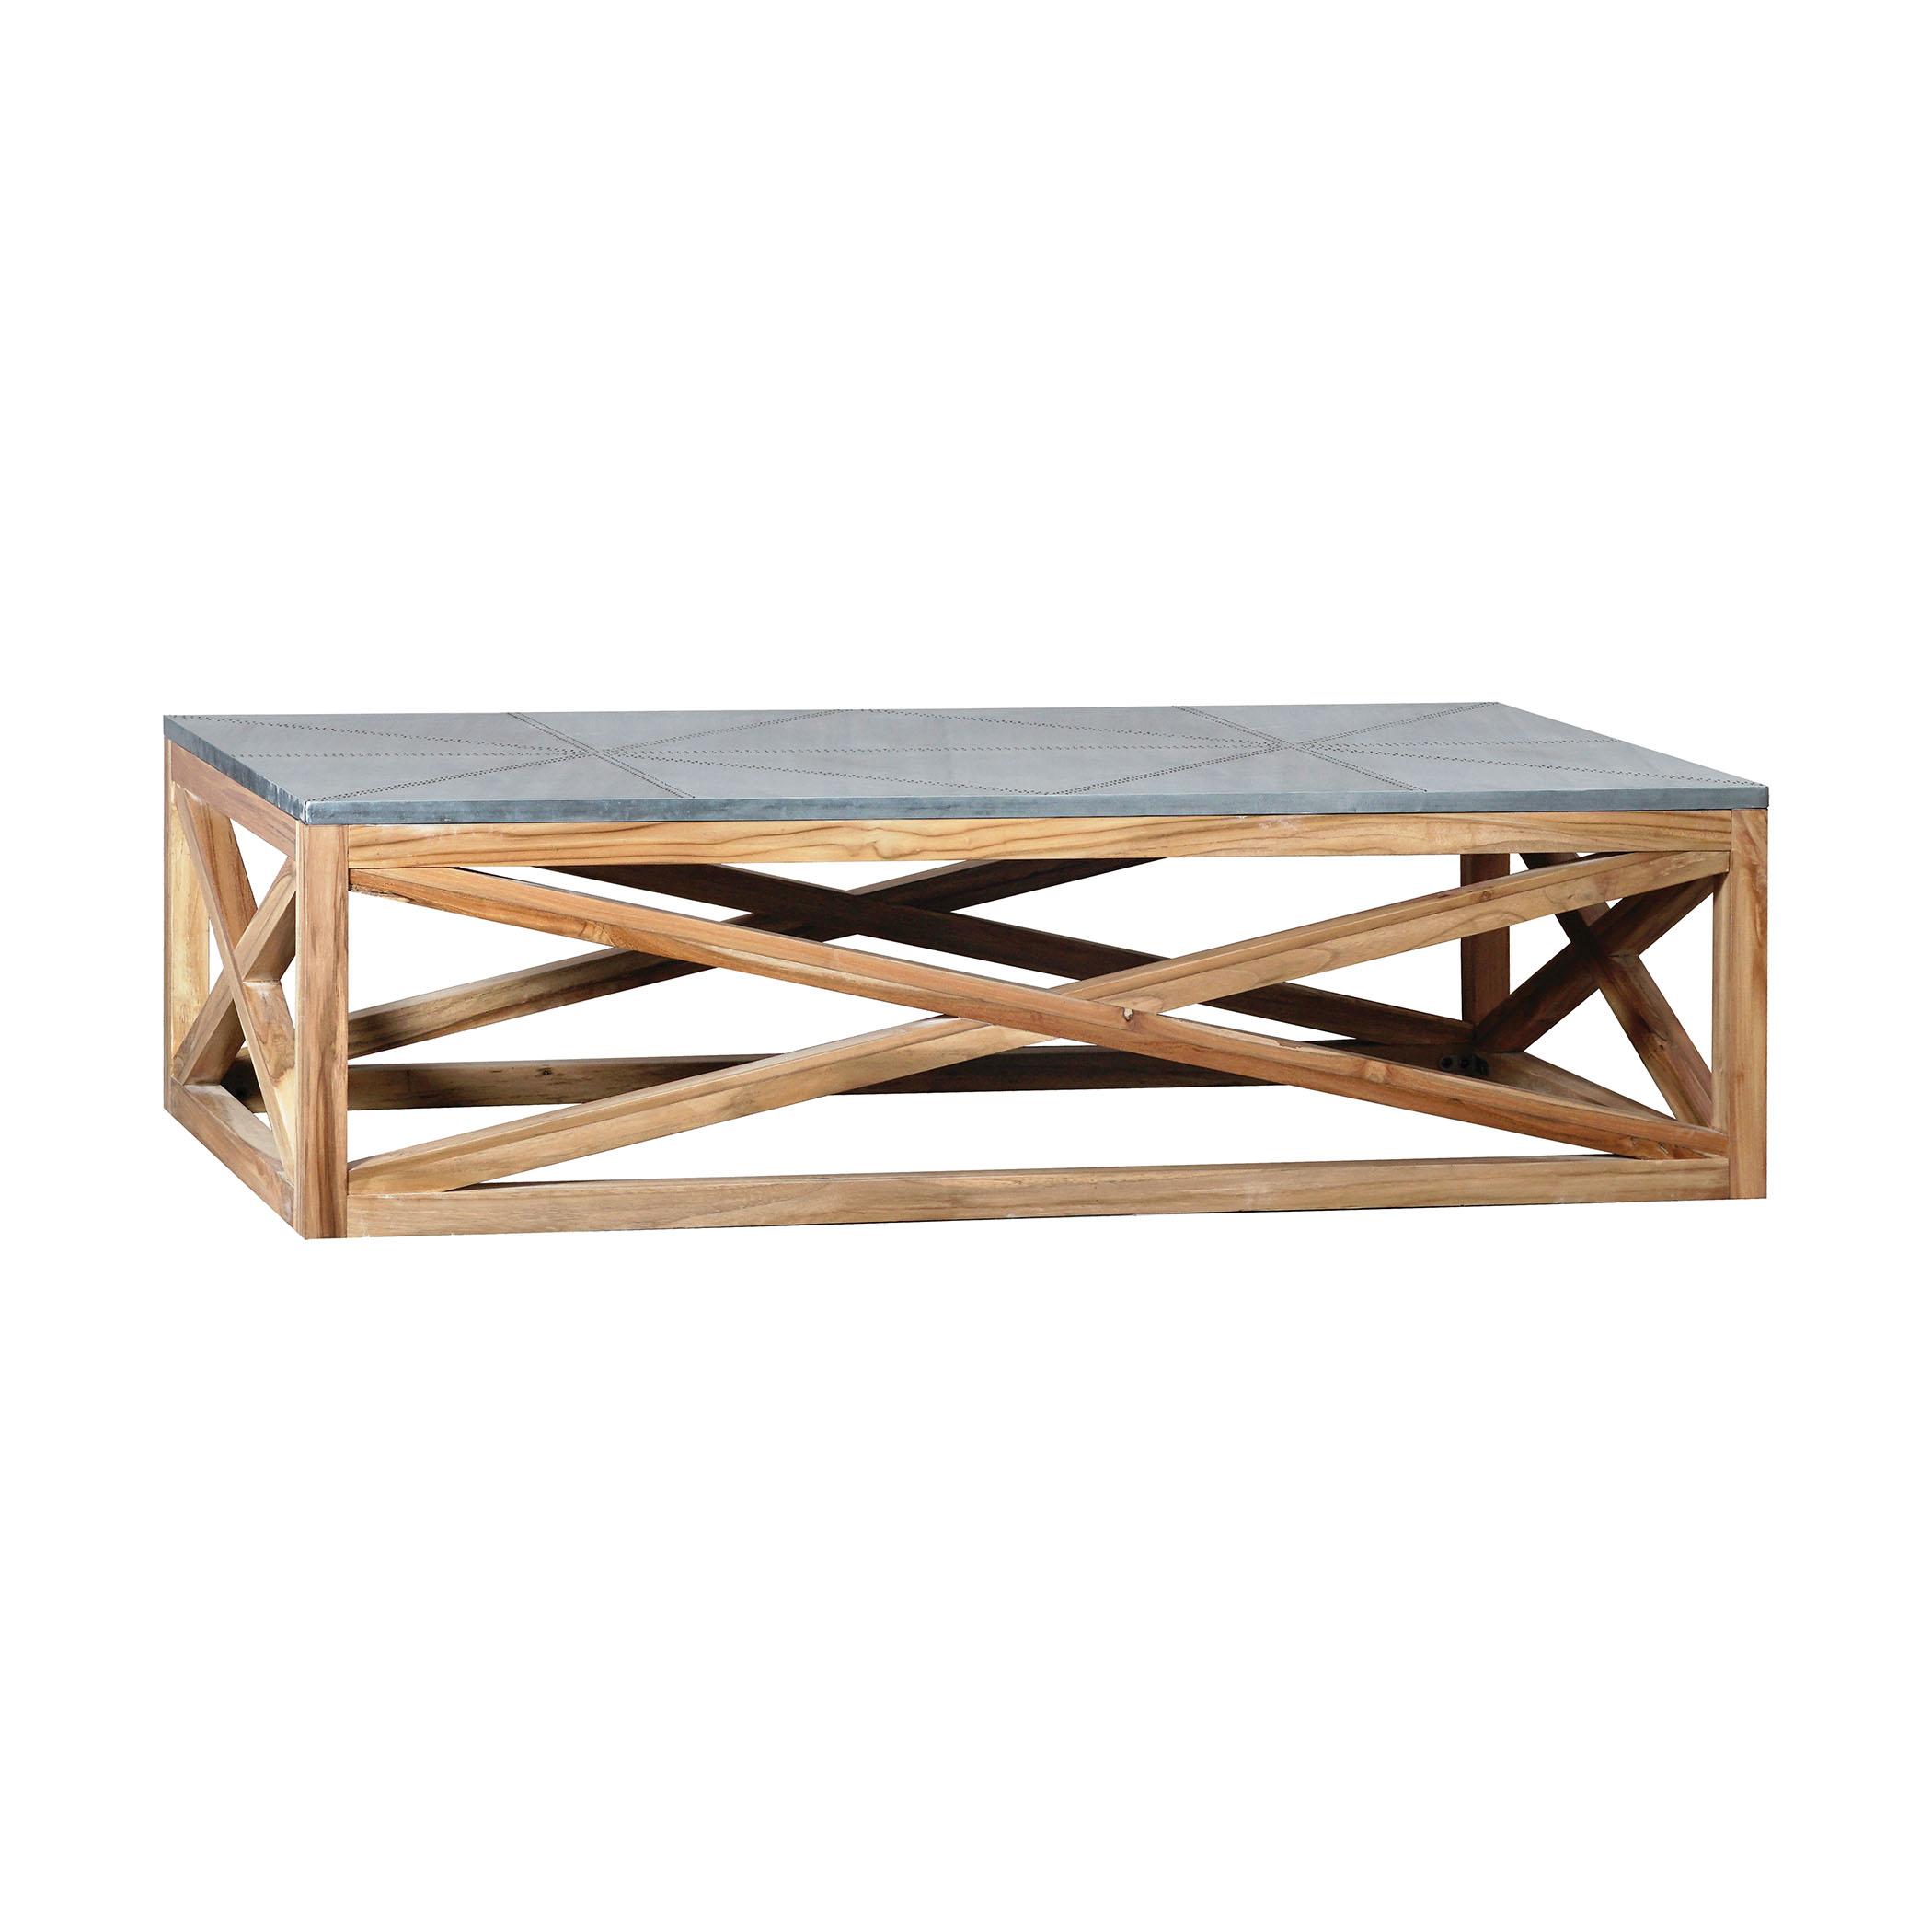 Tin Top Nantucket Coffee Table | Elk Home